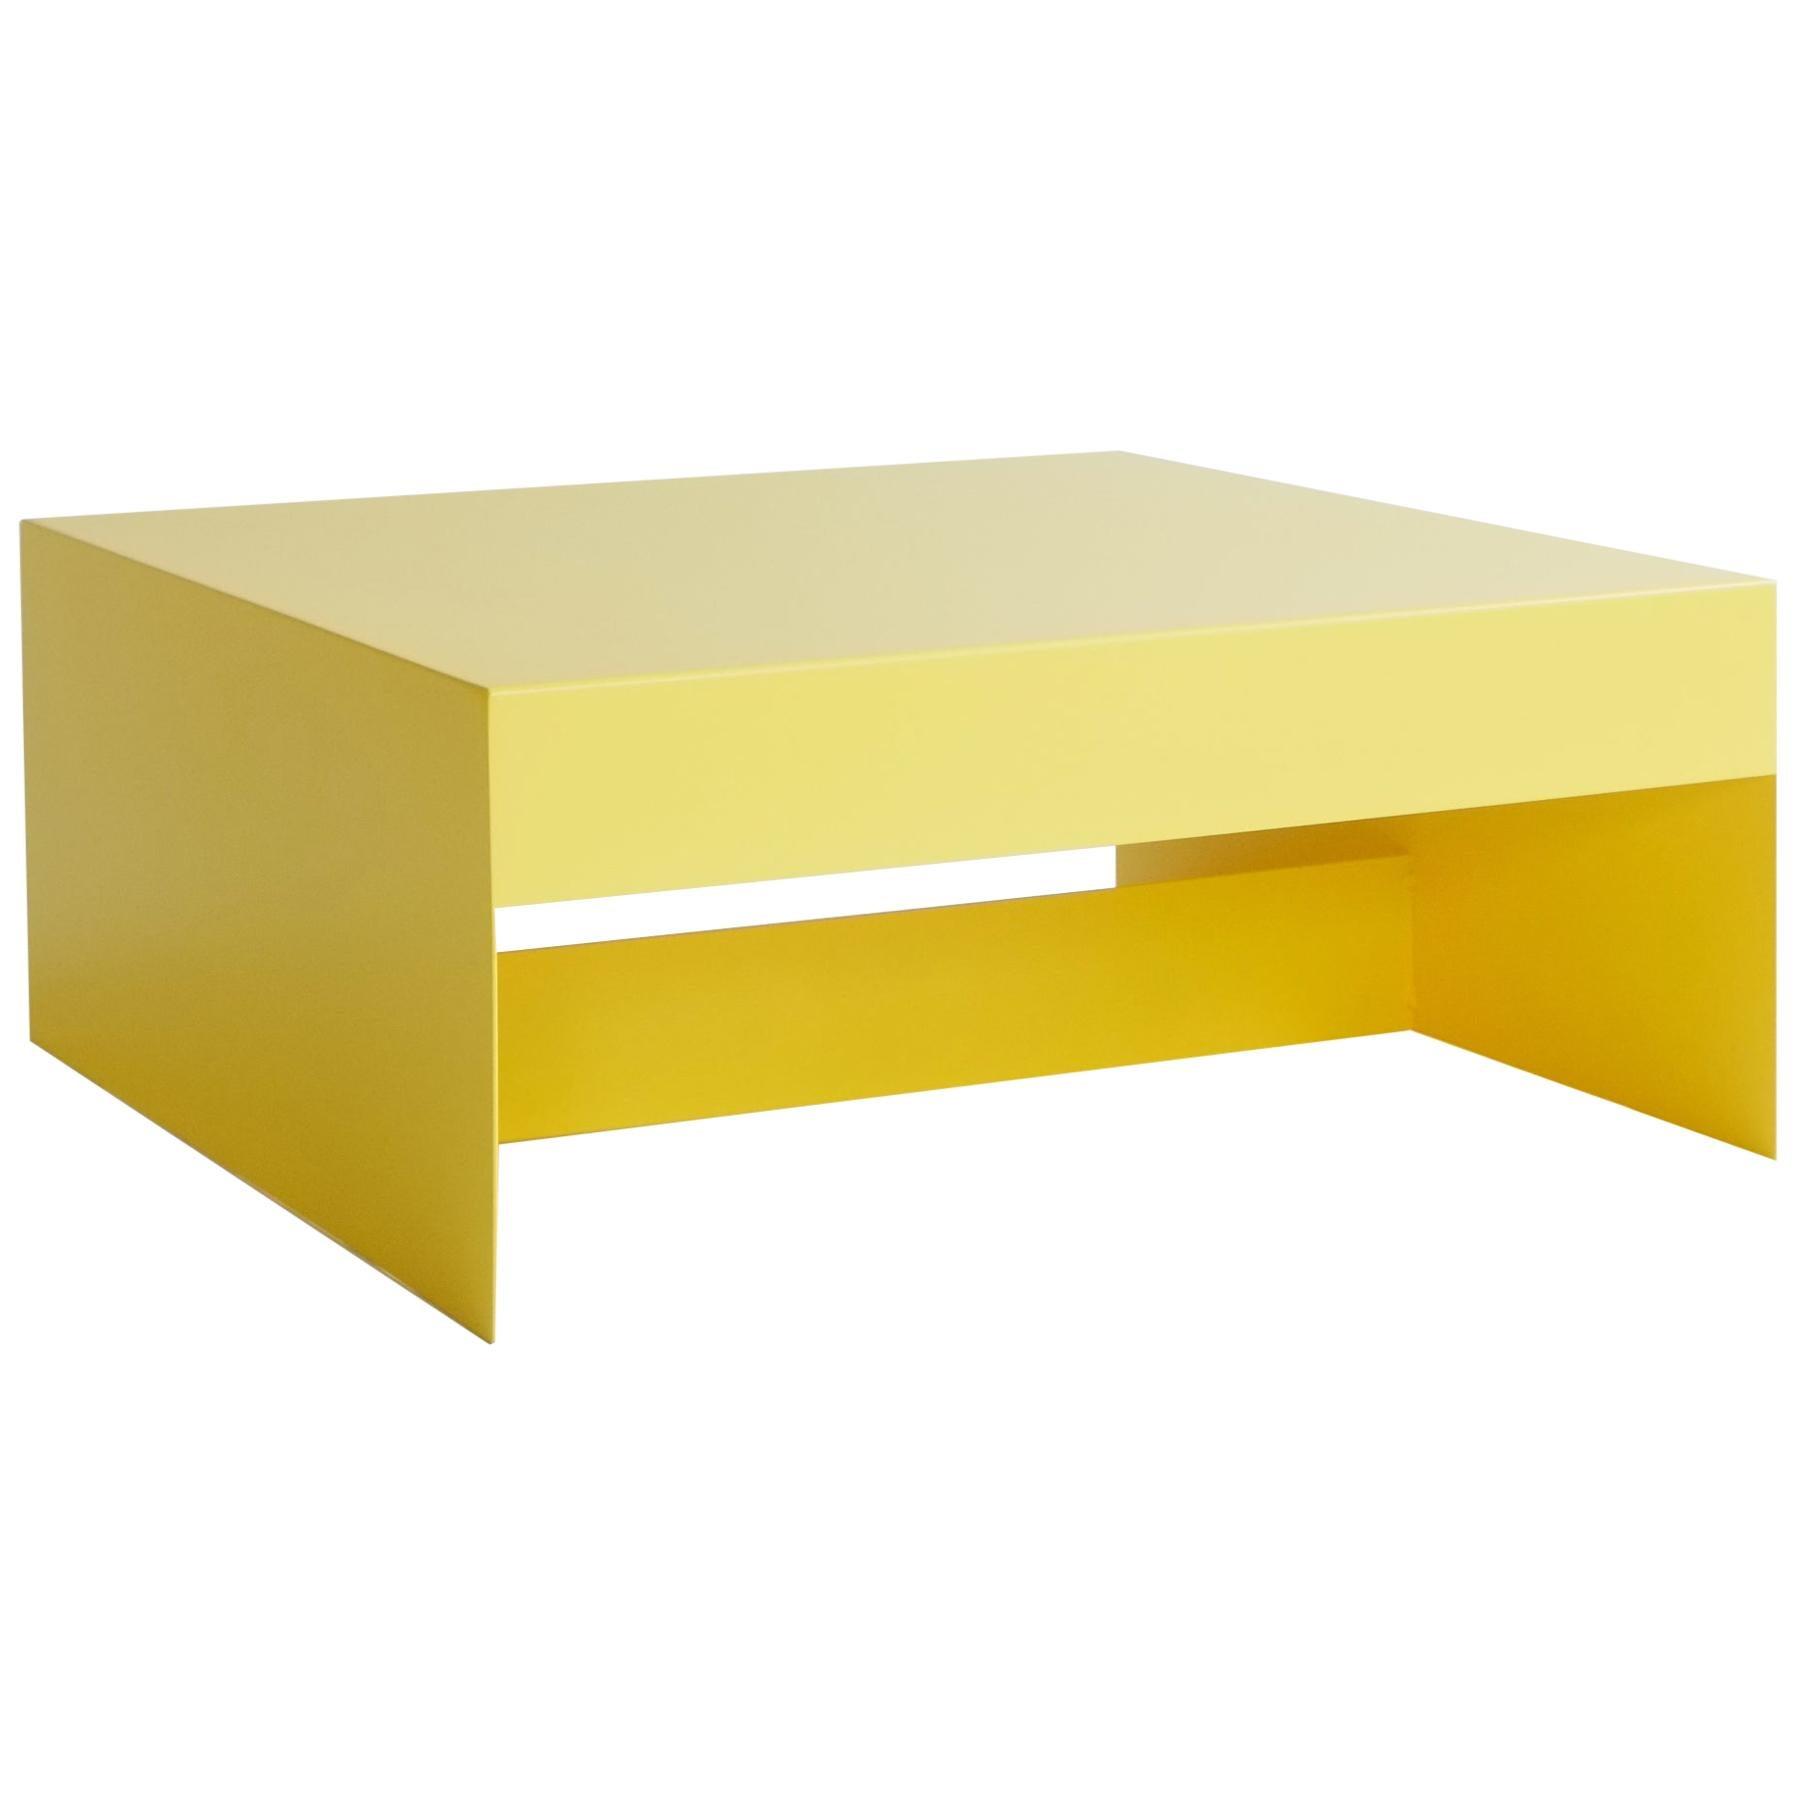 Matt Yellow, Single Form Square Aluminium Coffee Table, Customisable